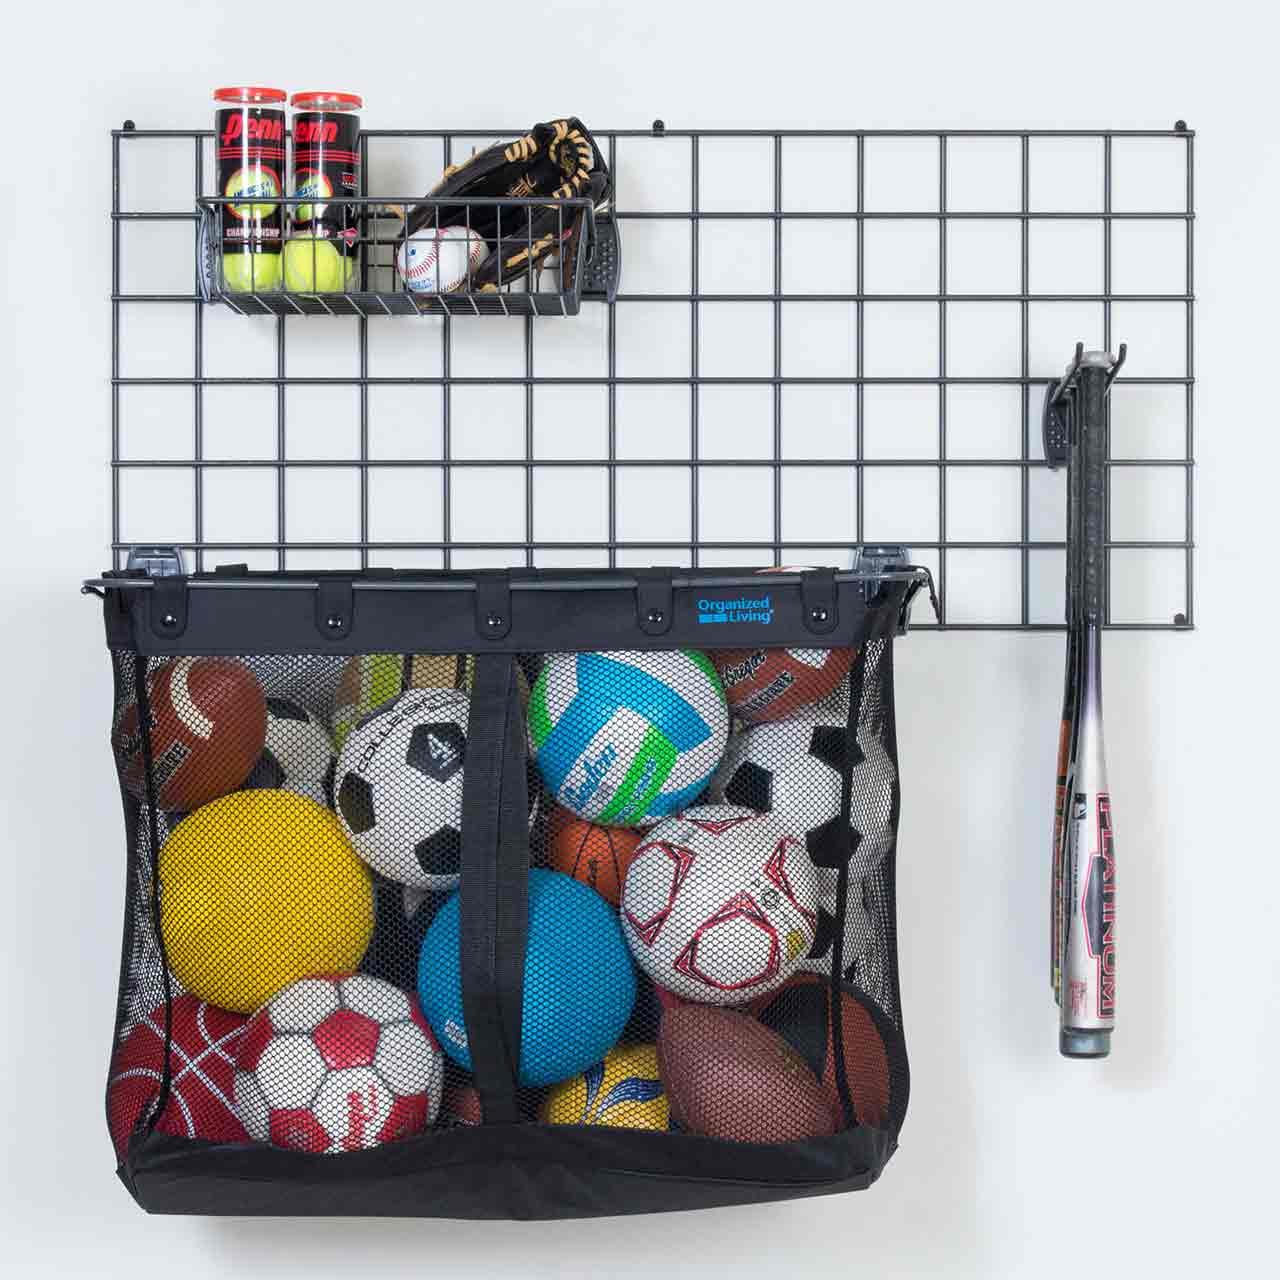 Sports Ball LG - Activity Organizer Kit